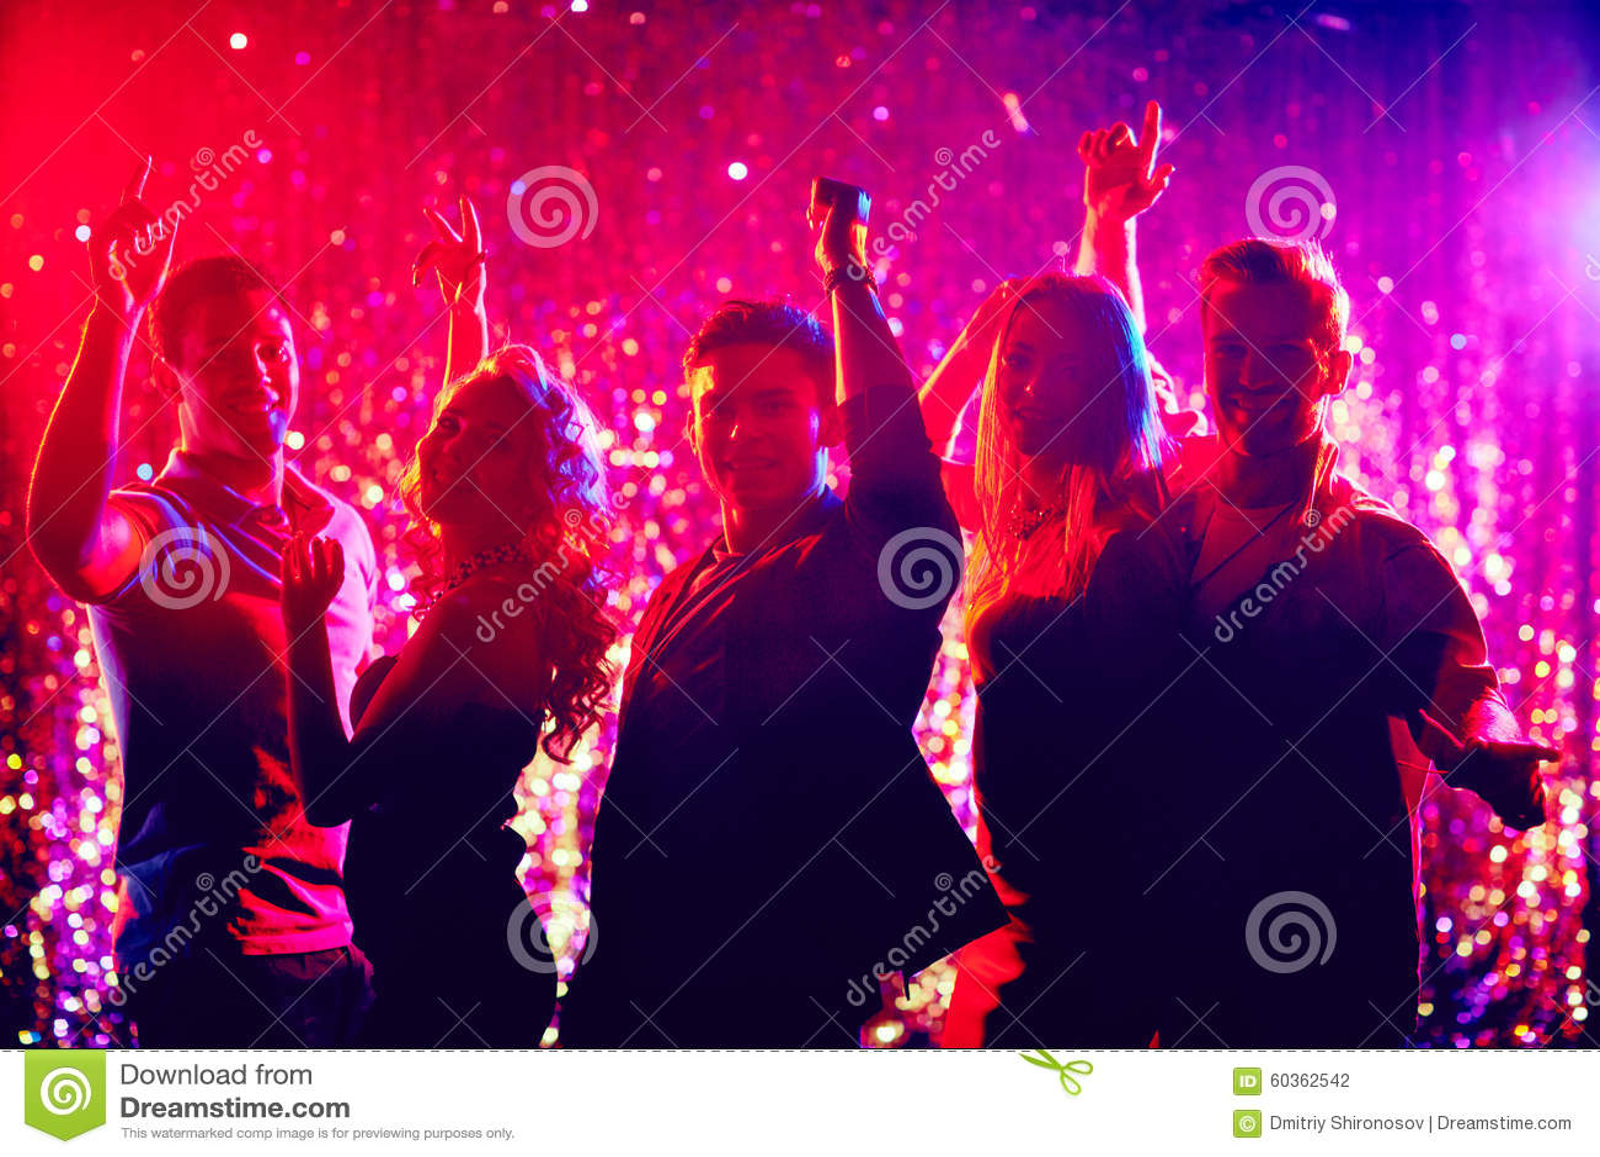 Tanzen in nachtclub stockfoto bild 60362542 - Nachtclub ...